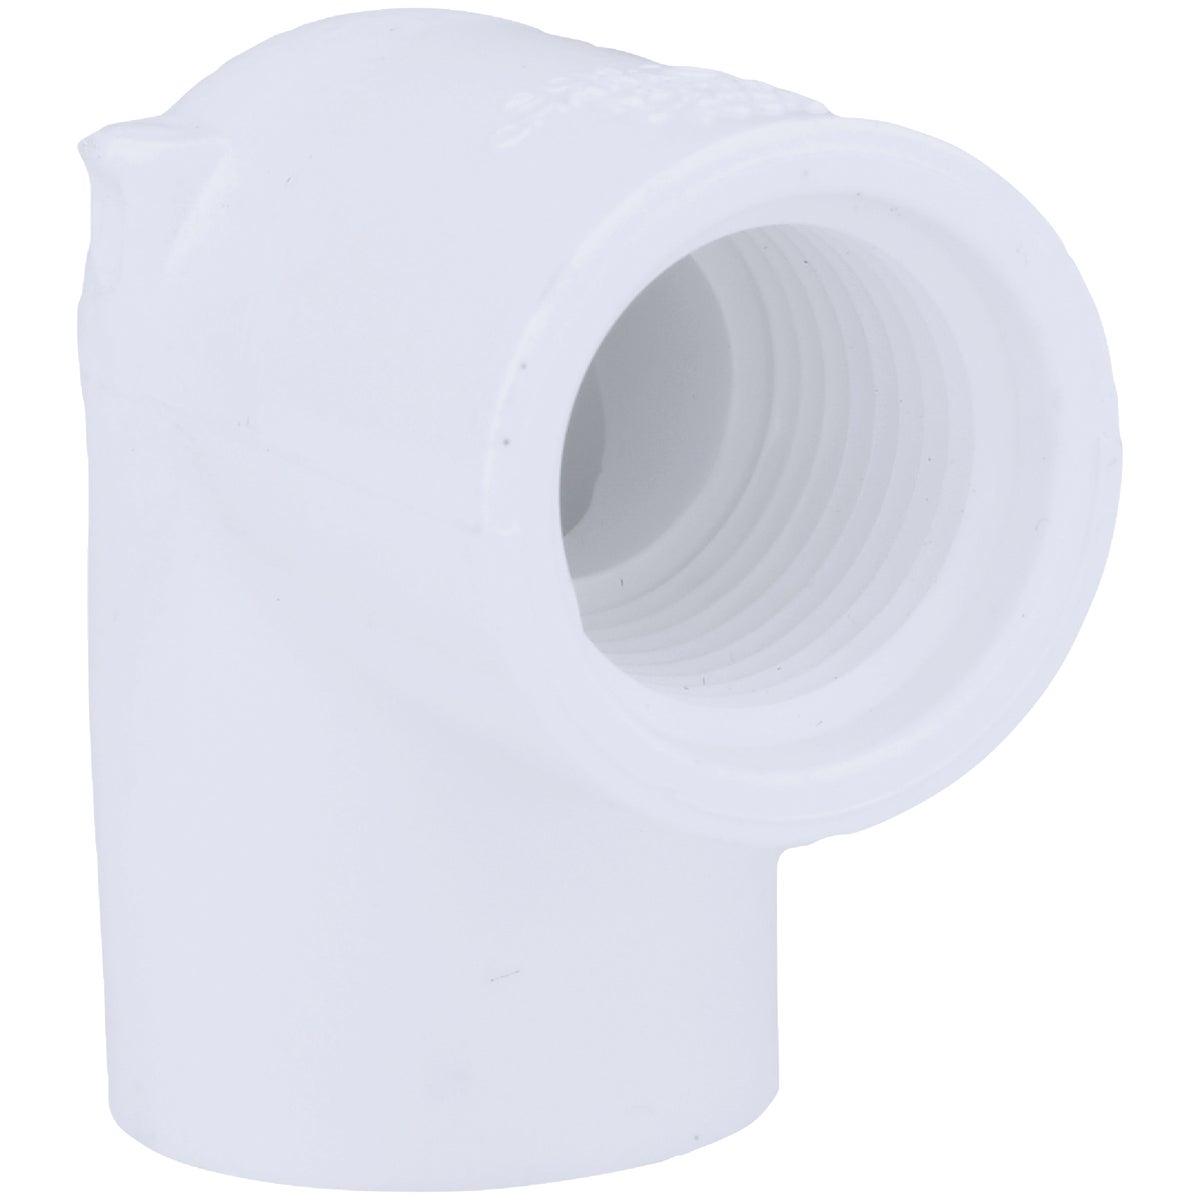 "1/2"" PVC FIPXS 90D ELBOW"